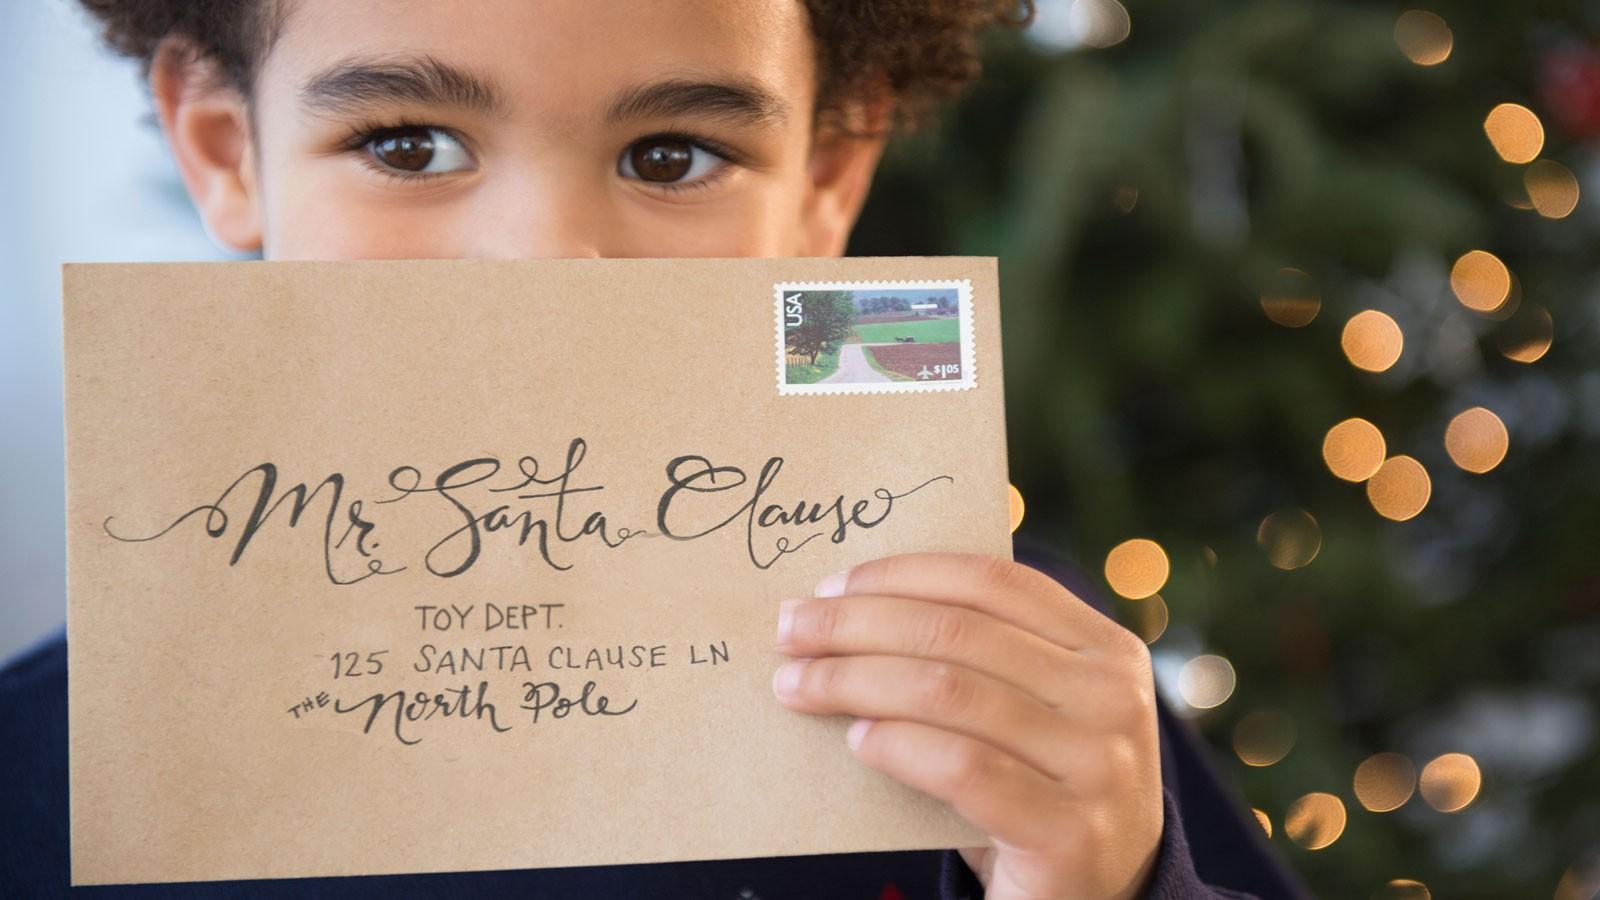 Boy holding letter addressed to Santa